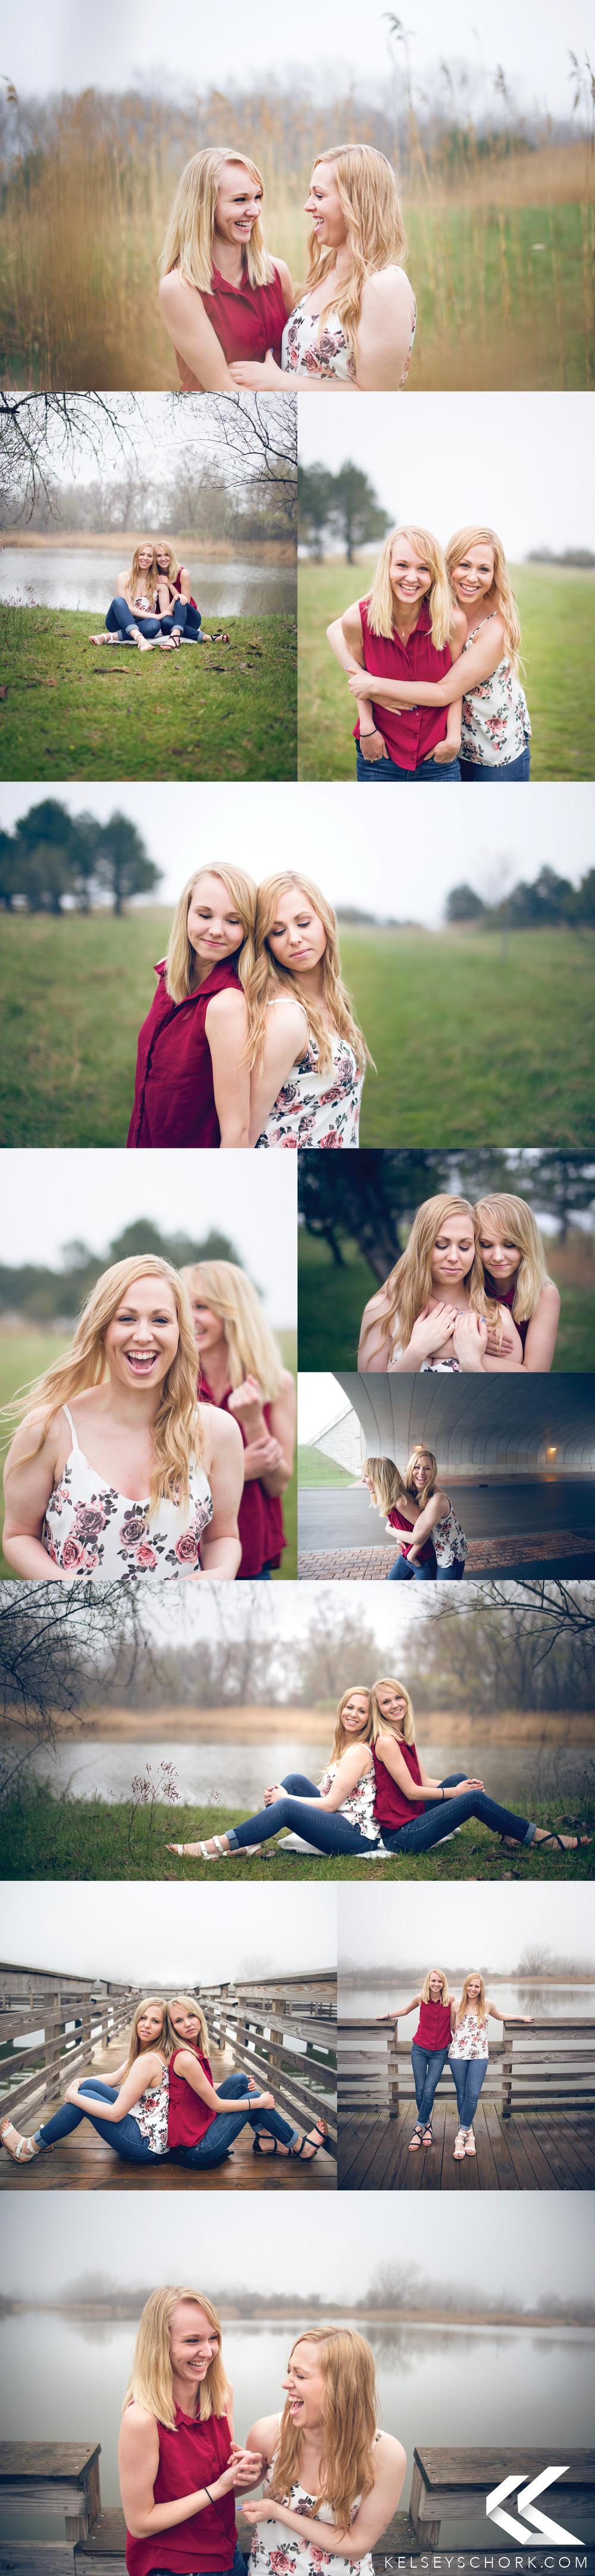 Lalka Sisters Siblings Photo Session